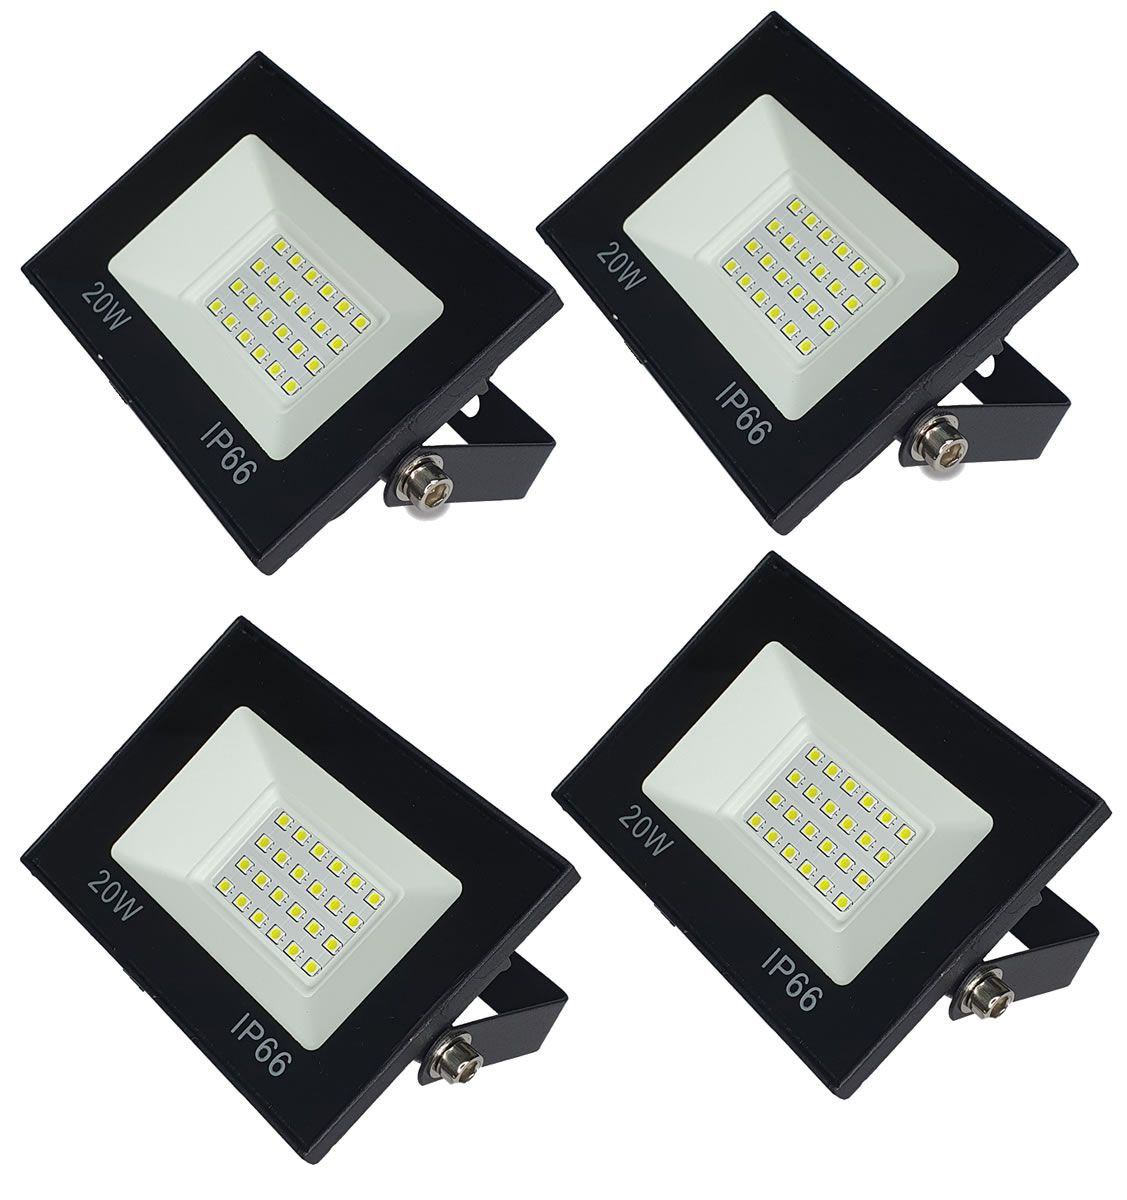 KIT 4 refletor 20w LED SMD Holofote Bivolt Externo Luz Branca